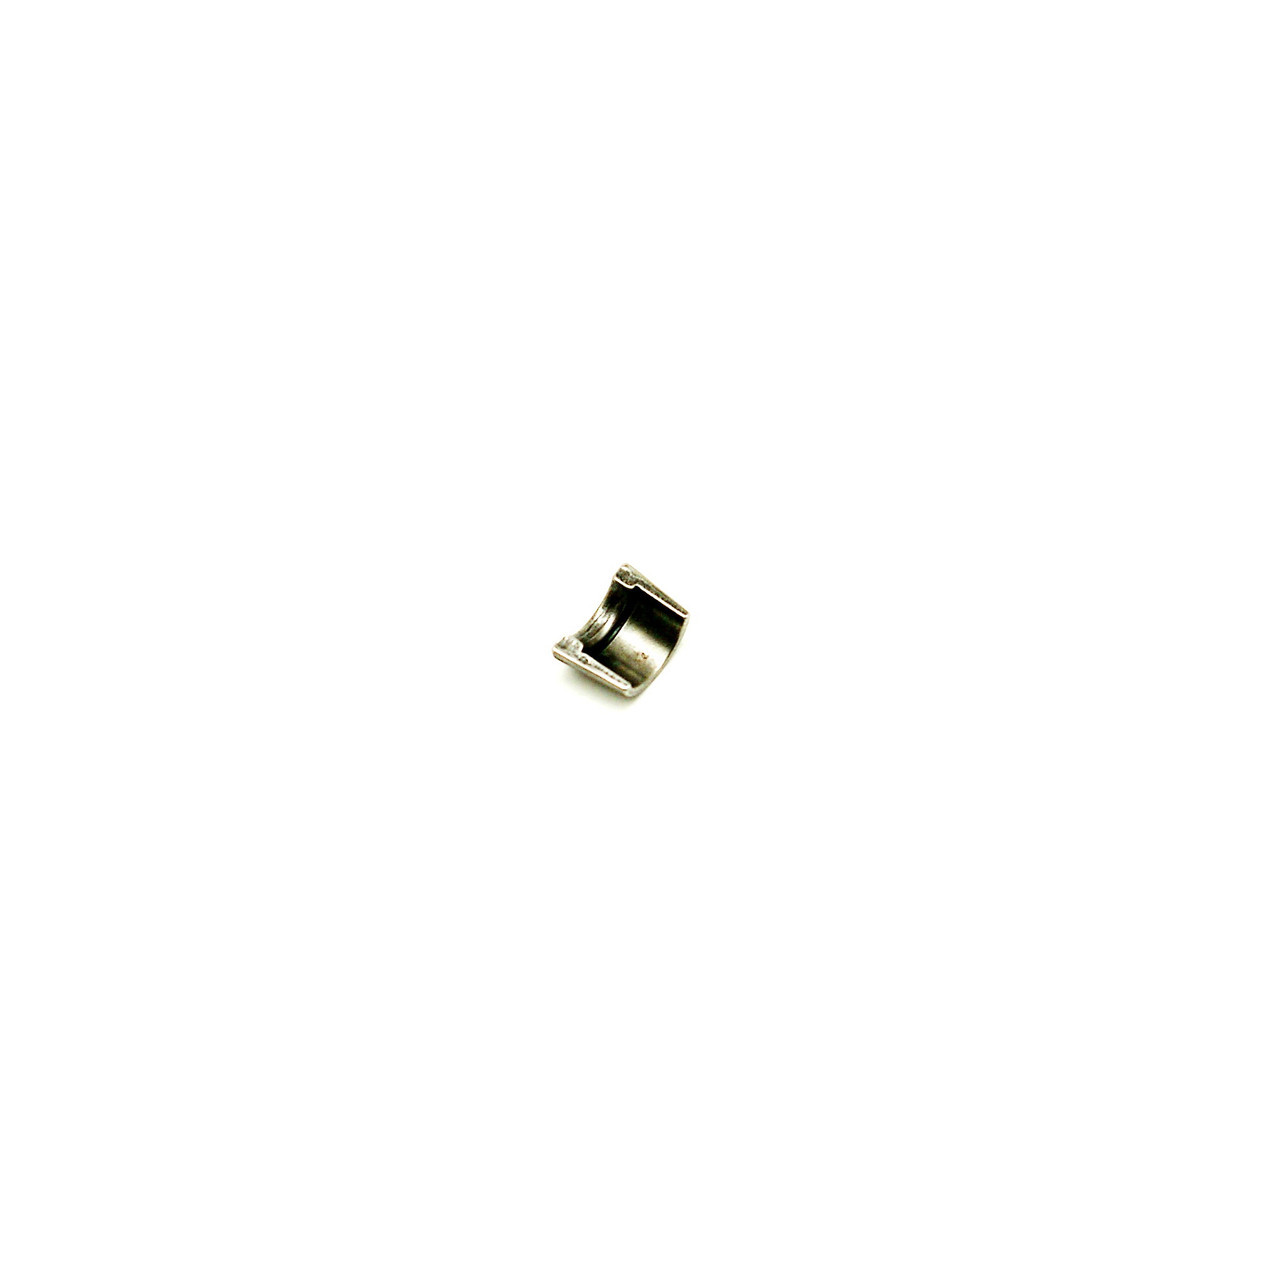 Сухарь клапана Cummins 4982898 C6204414520